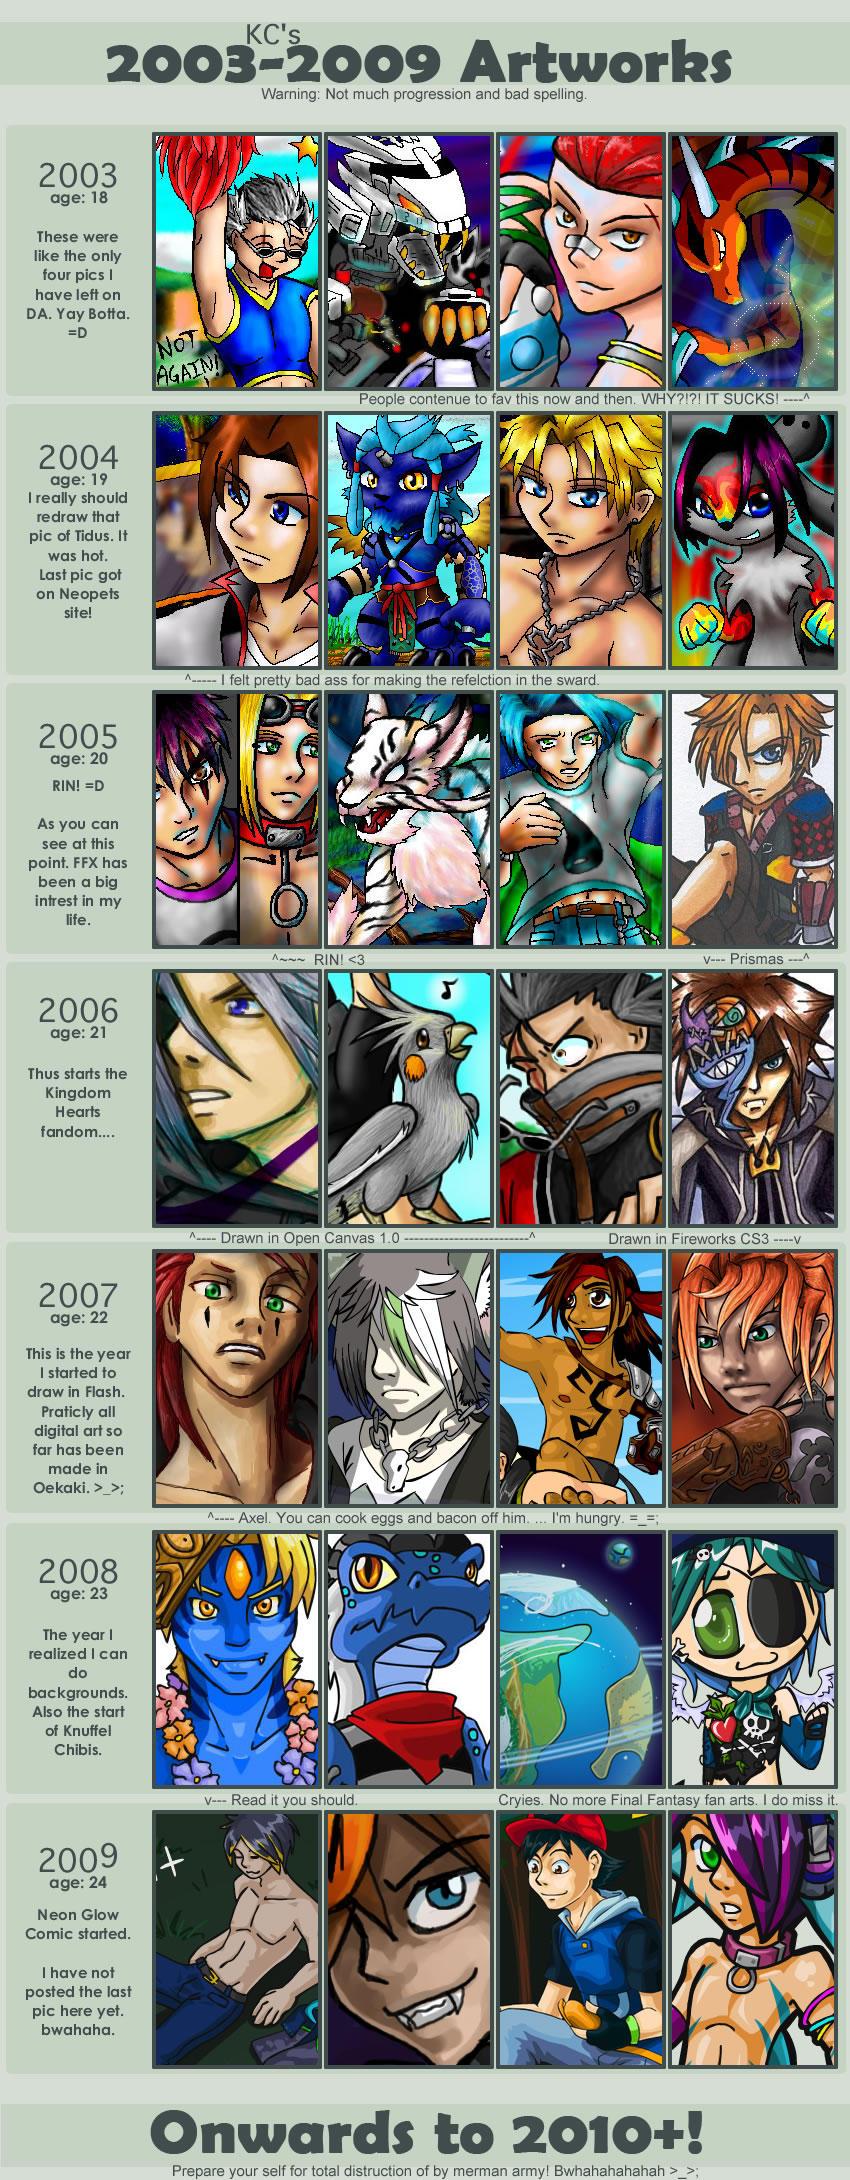 KC Art from 03 to 09 by AlkseeyaKC